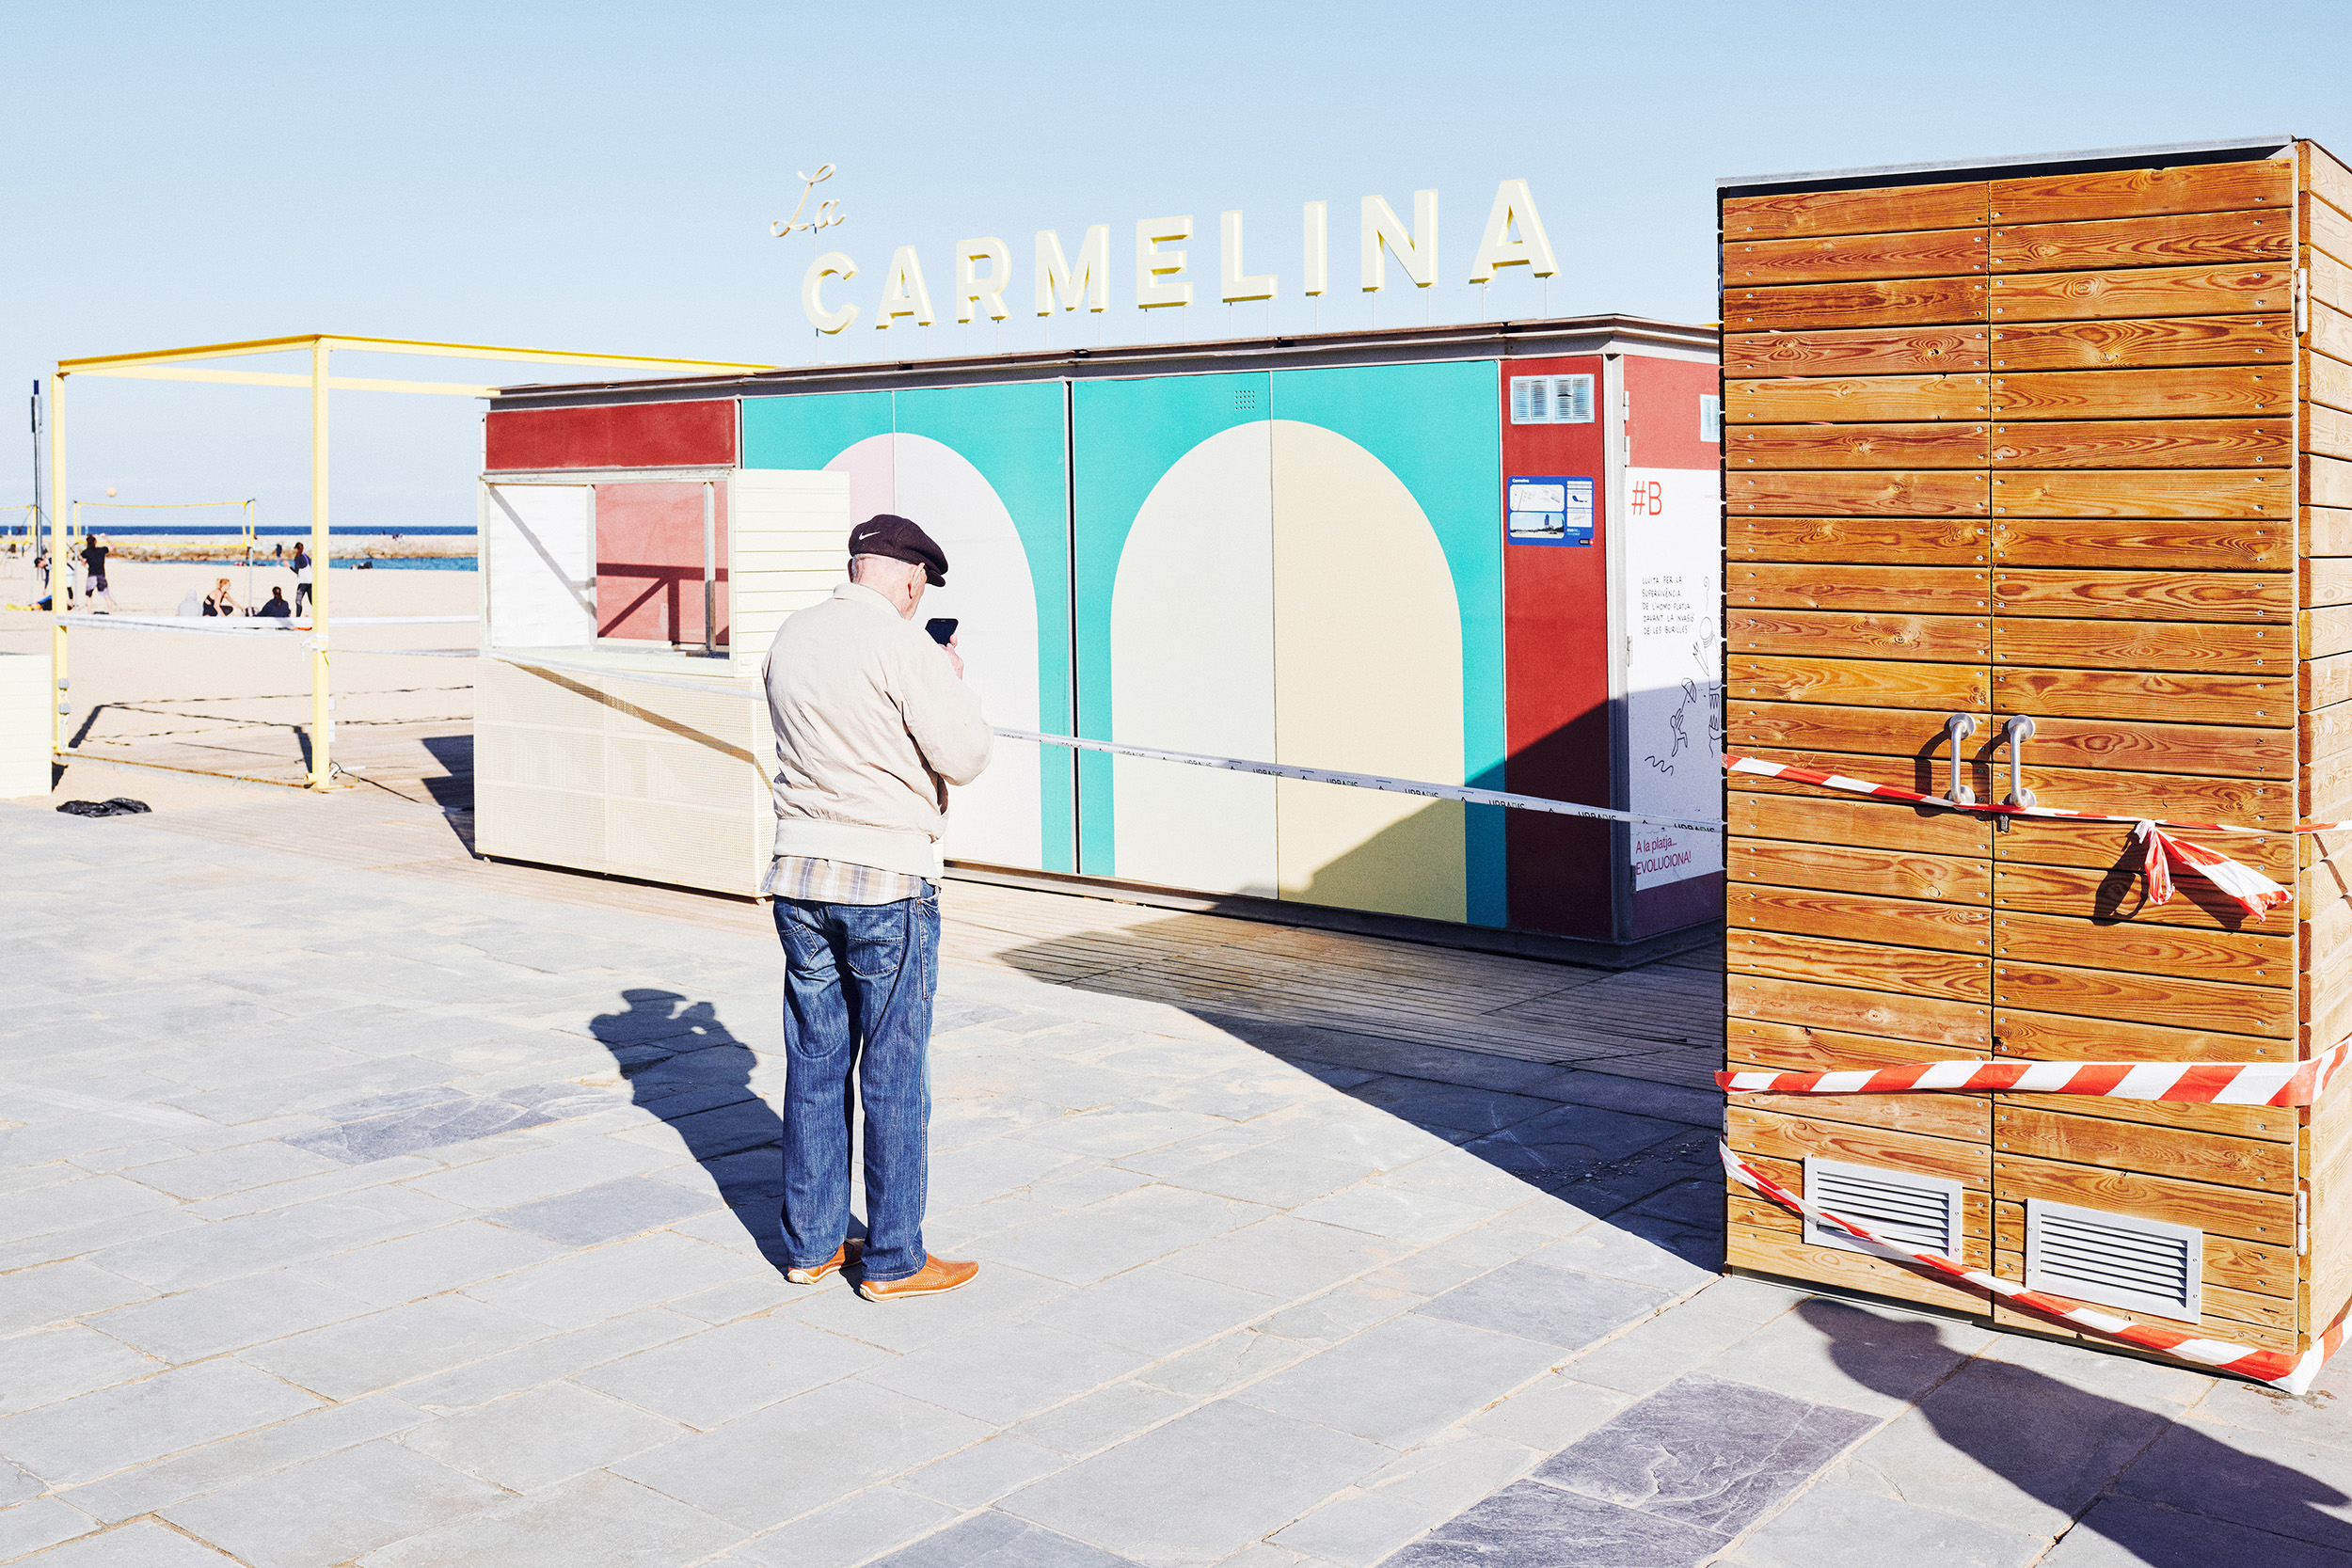 tink--barcelona--3620.jpg